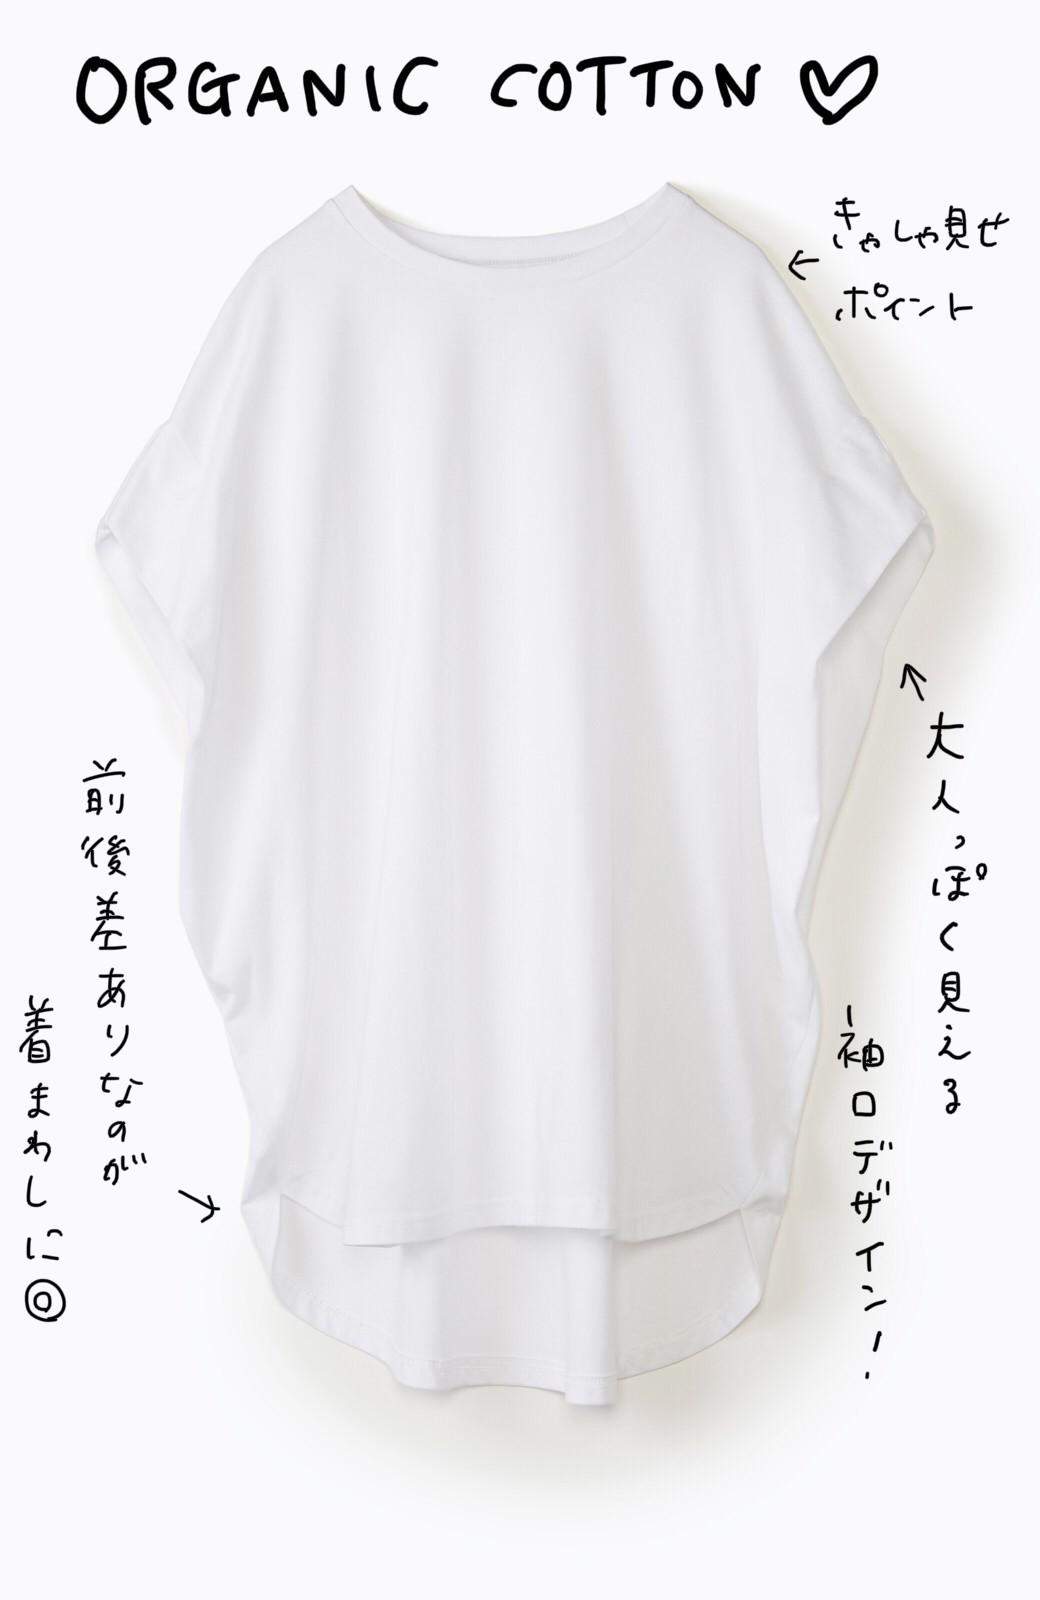 haco! PBPオーガニックコットン 楽ちんなのにブラウス気分で着られる大人のおめかしTシャツ <ホワイト>の商品写真2